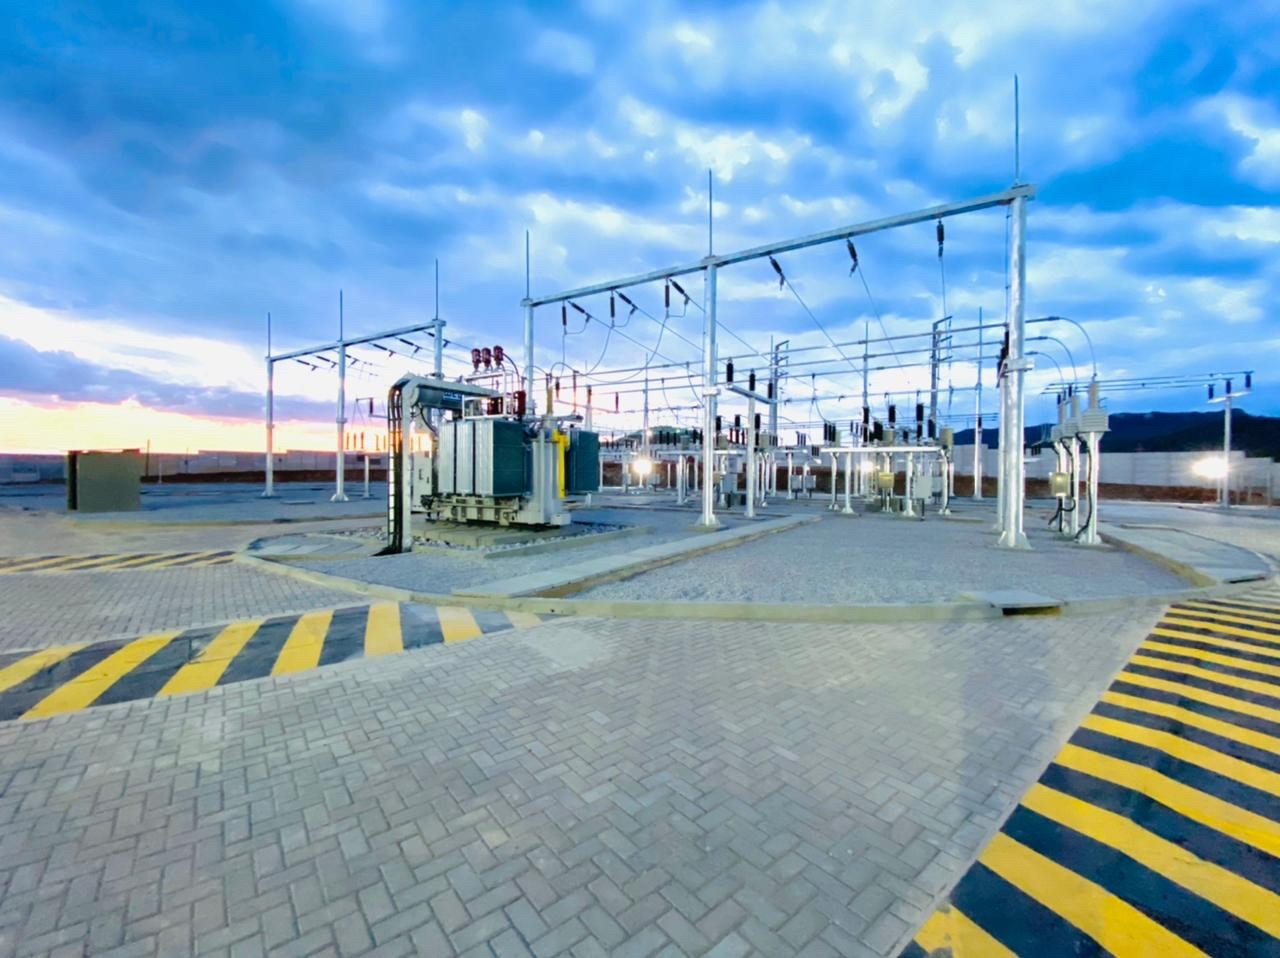 Cosern inaugura Subestação Elétrica Major Sales